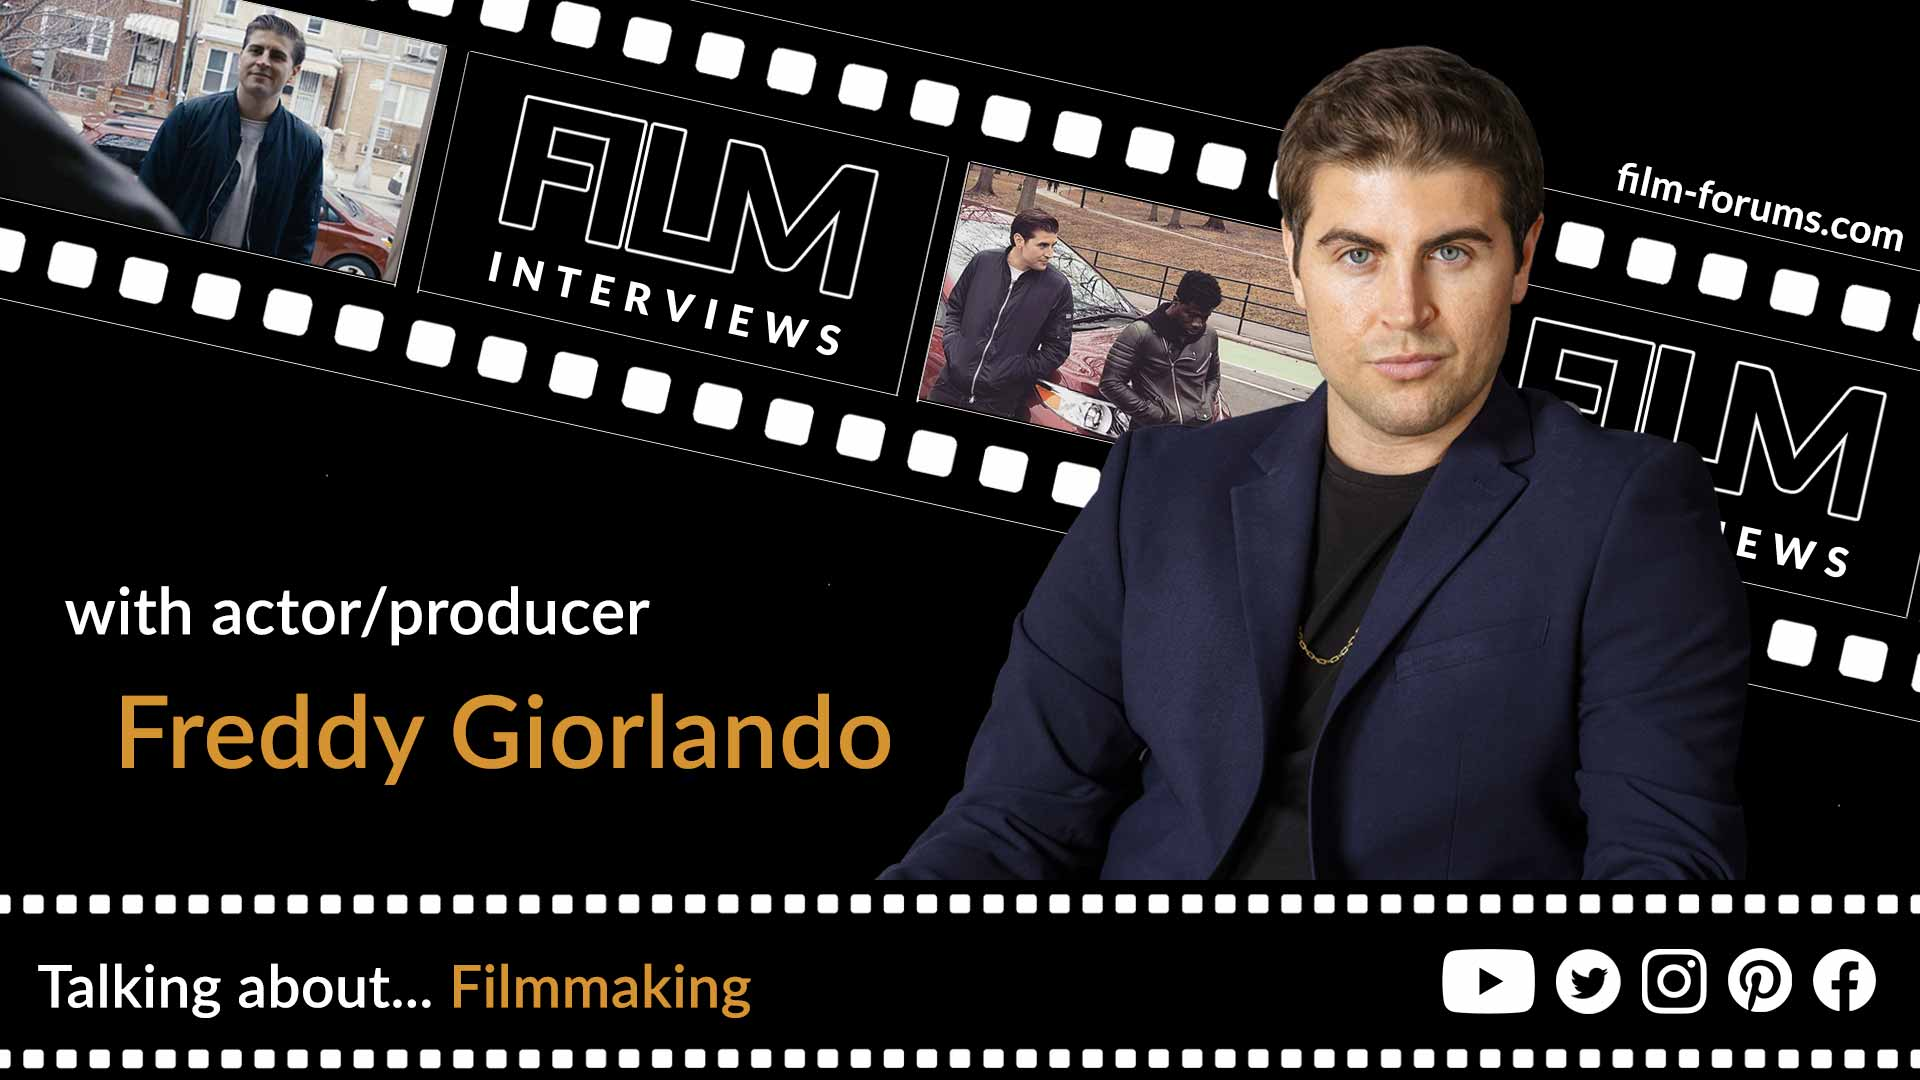 Freddy Giorlando, Actor and Producer